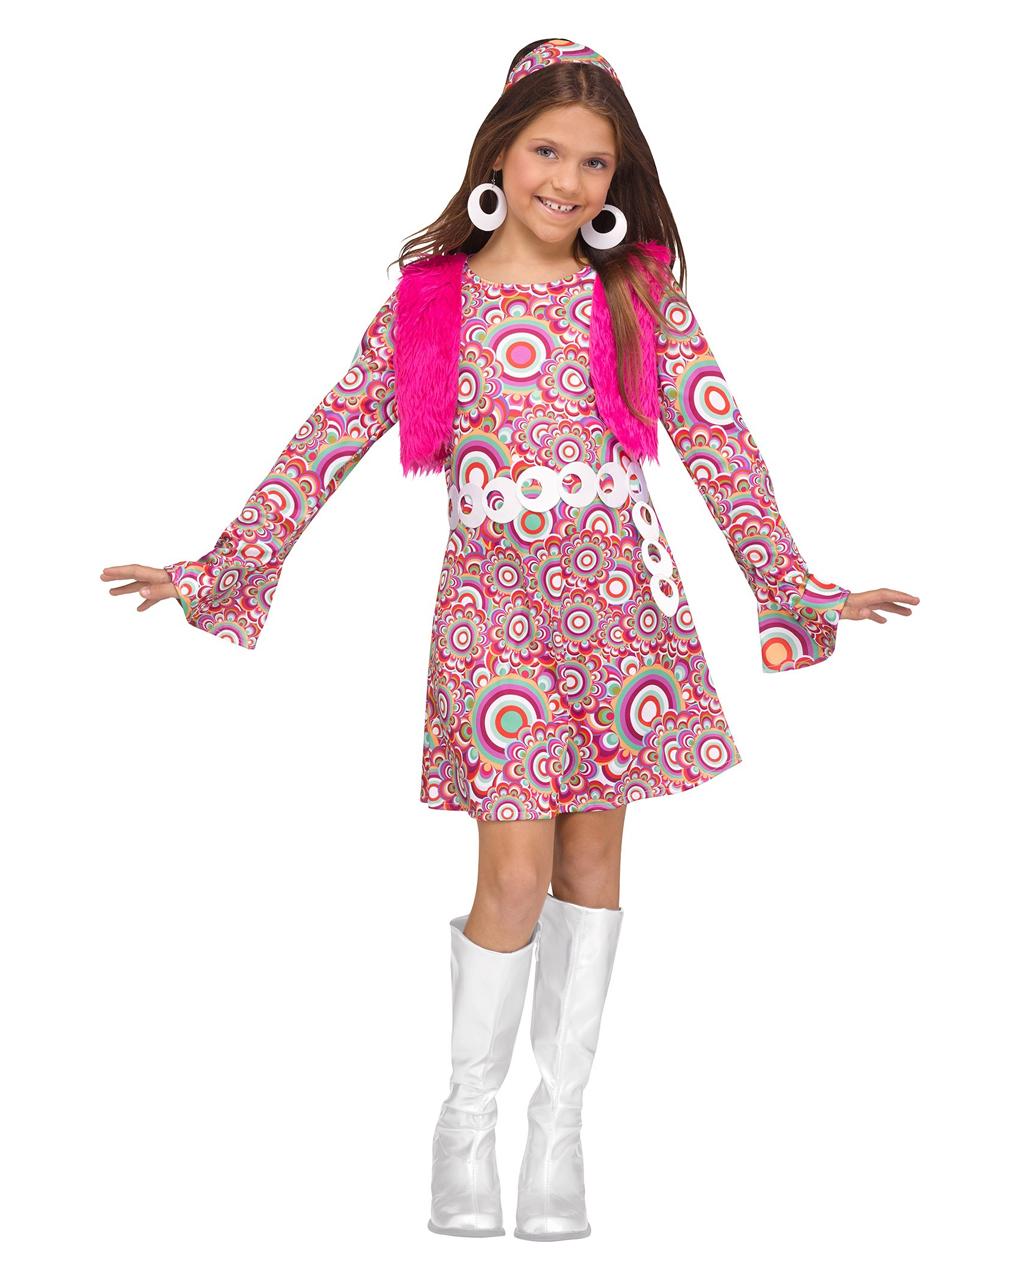 cad919903184a Flower Power Hippie Girl Costume for theme parties | horror-shop.com